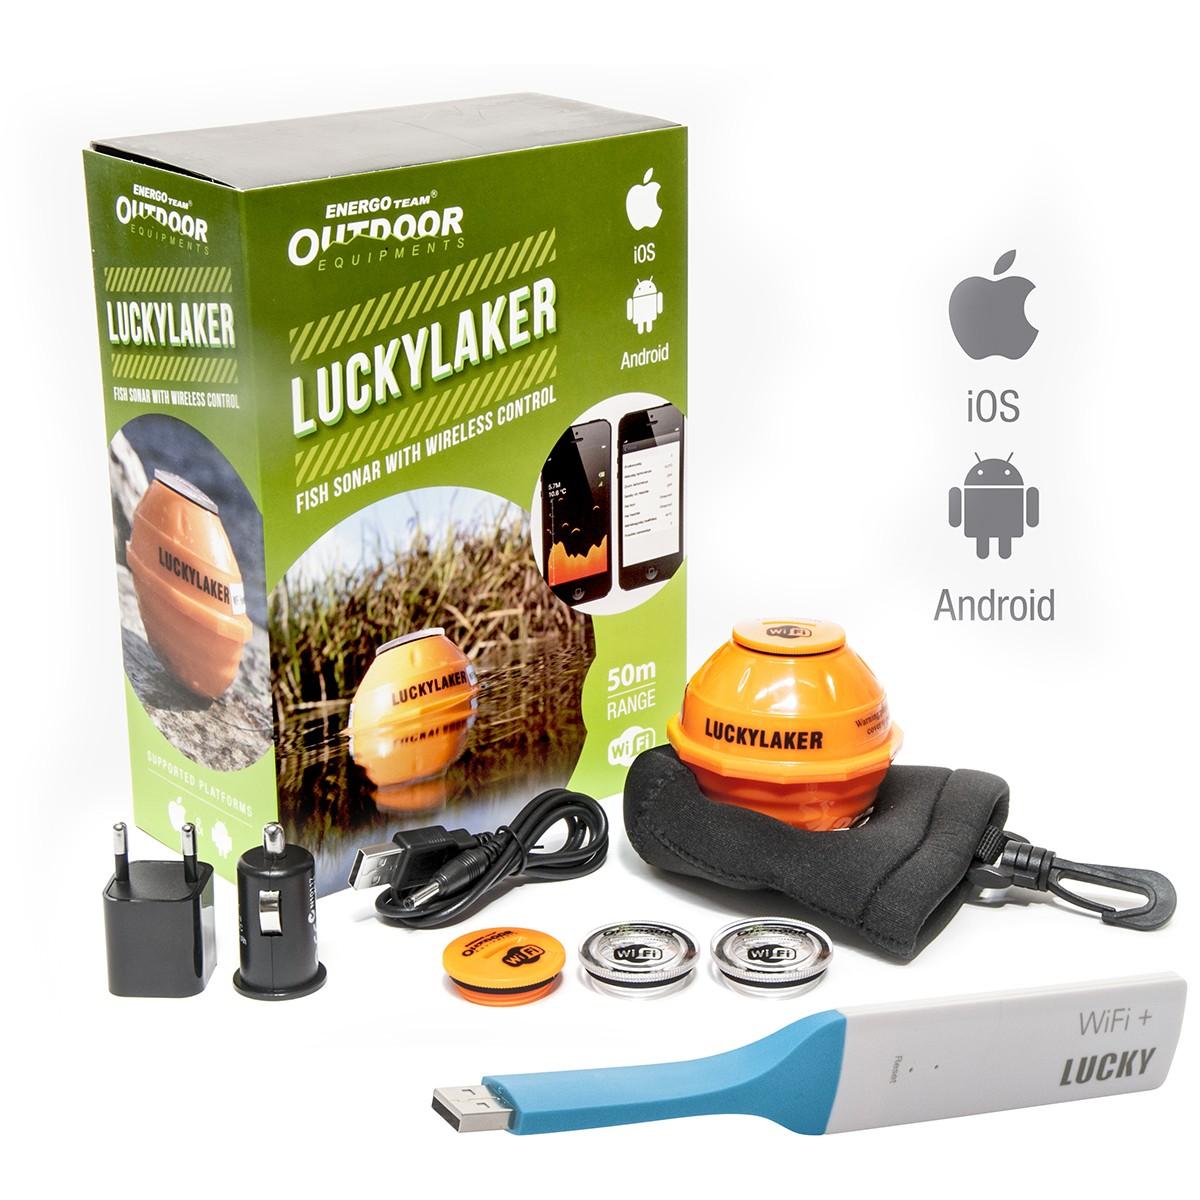 SONAR WIFI SMART ENERGO TEAM OUTDOOR LUCKY LAKER - 74871100